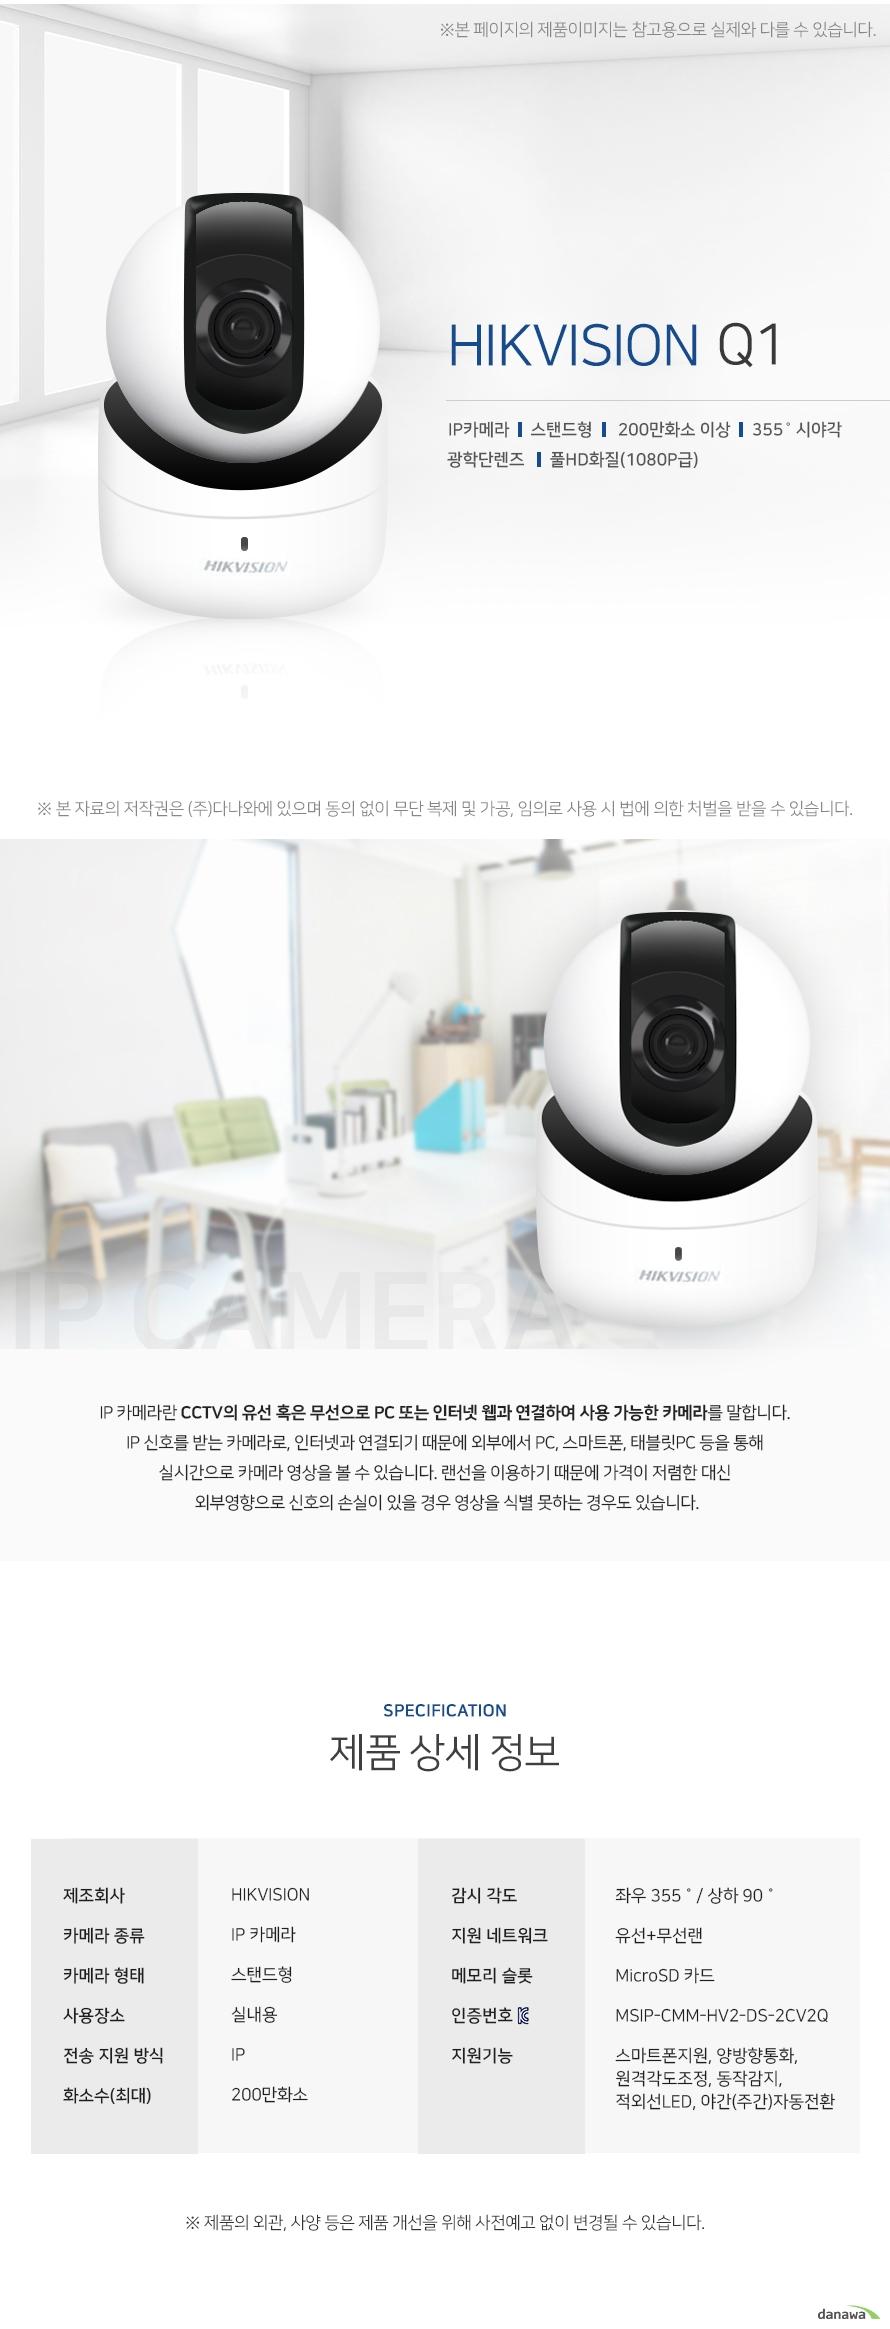 HIKVISION q1 ip카메라 스탠드형 200만화소이상 355도 시야각 광학단렌즈 풀 HD화질   IP 카메라란 CCTV의 유선 혹은 무선으로 PC 또는 인터넷 웹과 연결하여 사용 가능한 카메라를 말합니다. IP 신호를 받는 카메라로, 인터넷과 연결되기 때문에 외부에서 PC, 스마트폰, 태블릿PC 등을 통해 실시간으로 카메라 영상을 볼 수 있습니다. 랜선을 이용하기 때문에 가격이 저렴한 대신  외부영향으로 신호의 손실이 있을 경우 영상을 식별 못하는 경우도 있습니다.제품상세정보